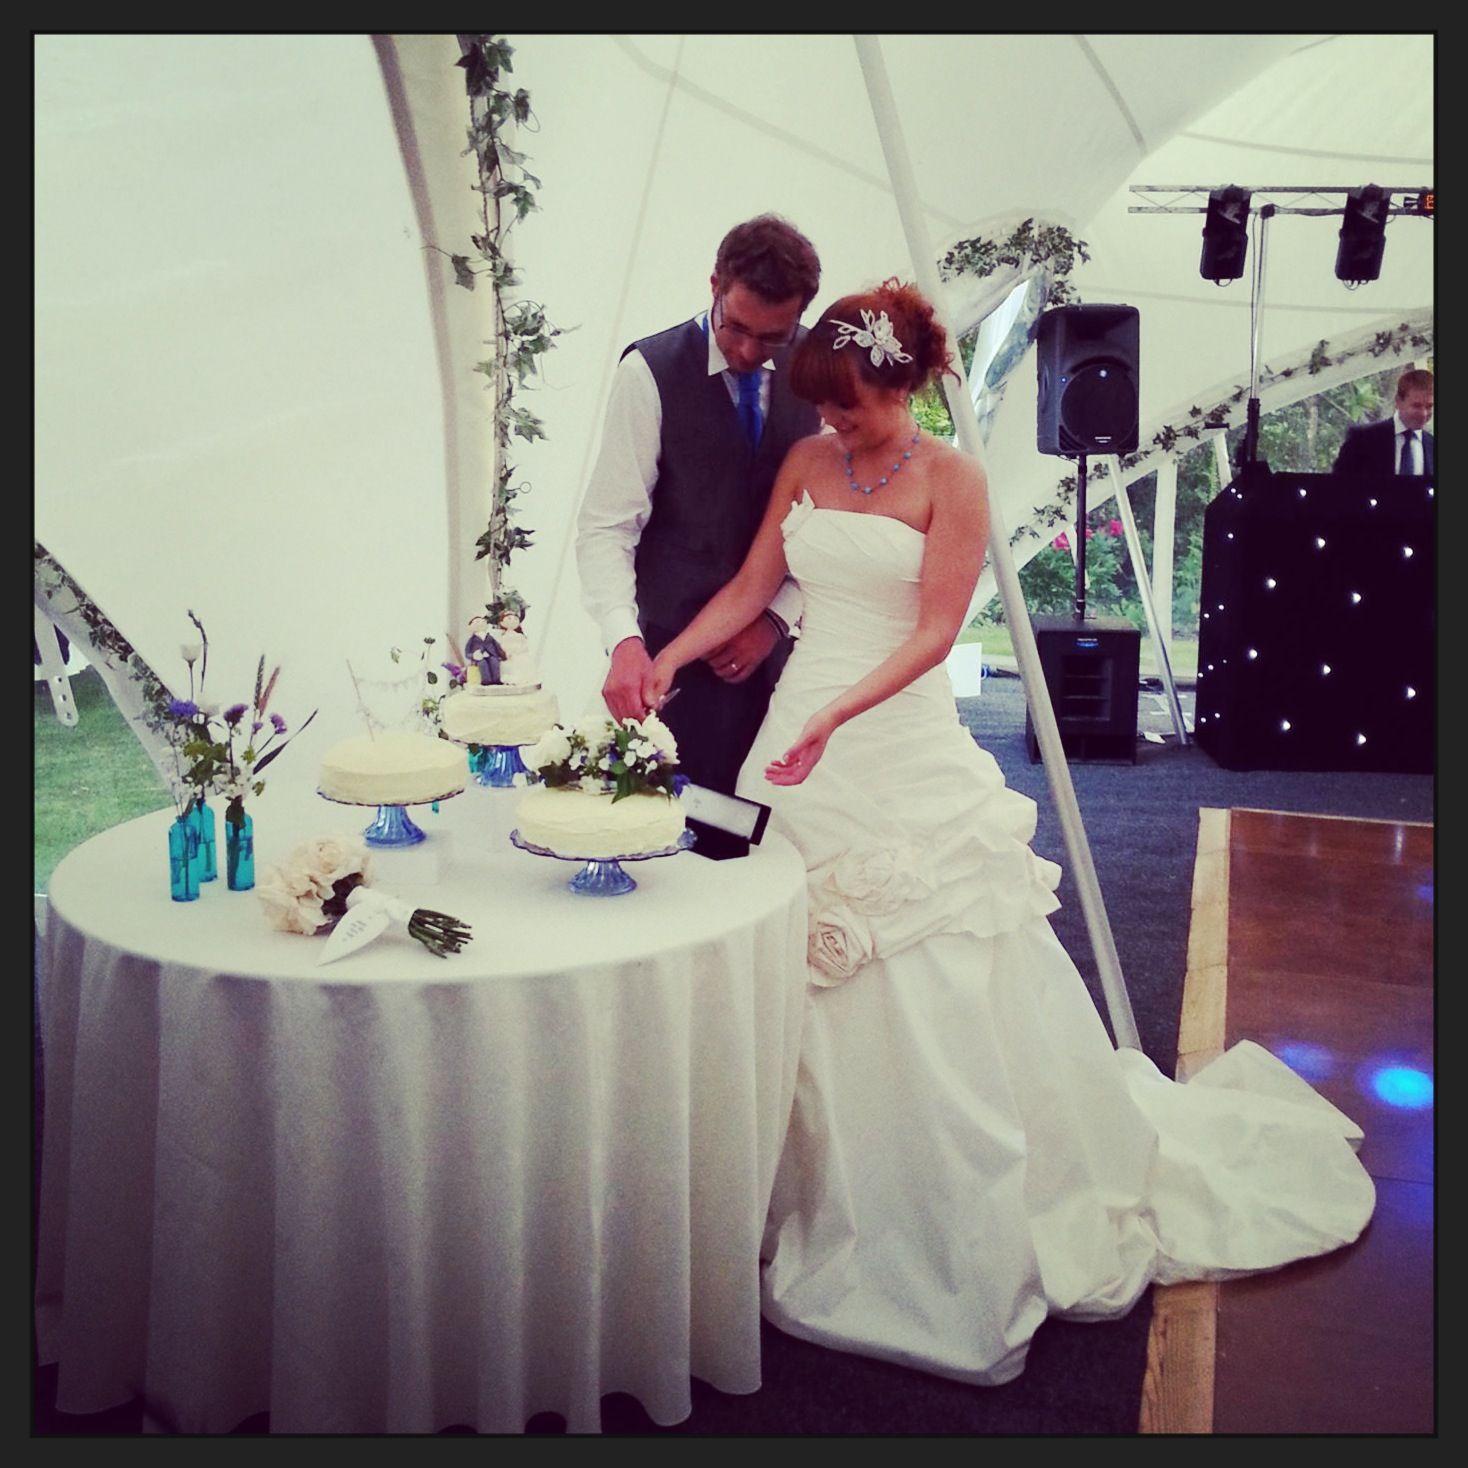 #groom #bride #wedding #cake #cuttingcake #weddingdress #donnasalado